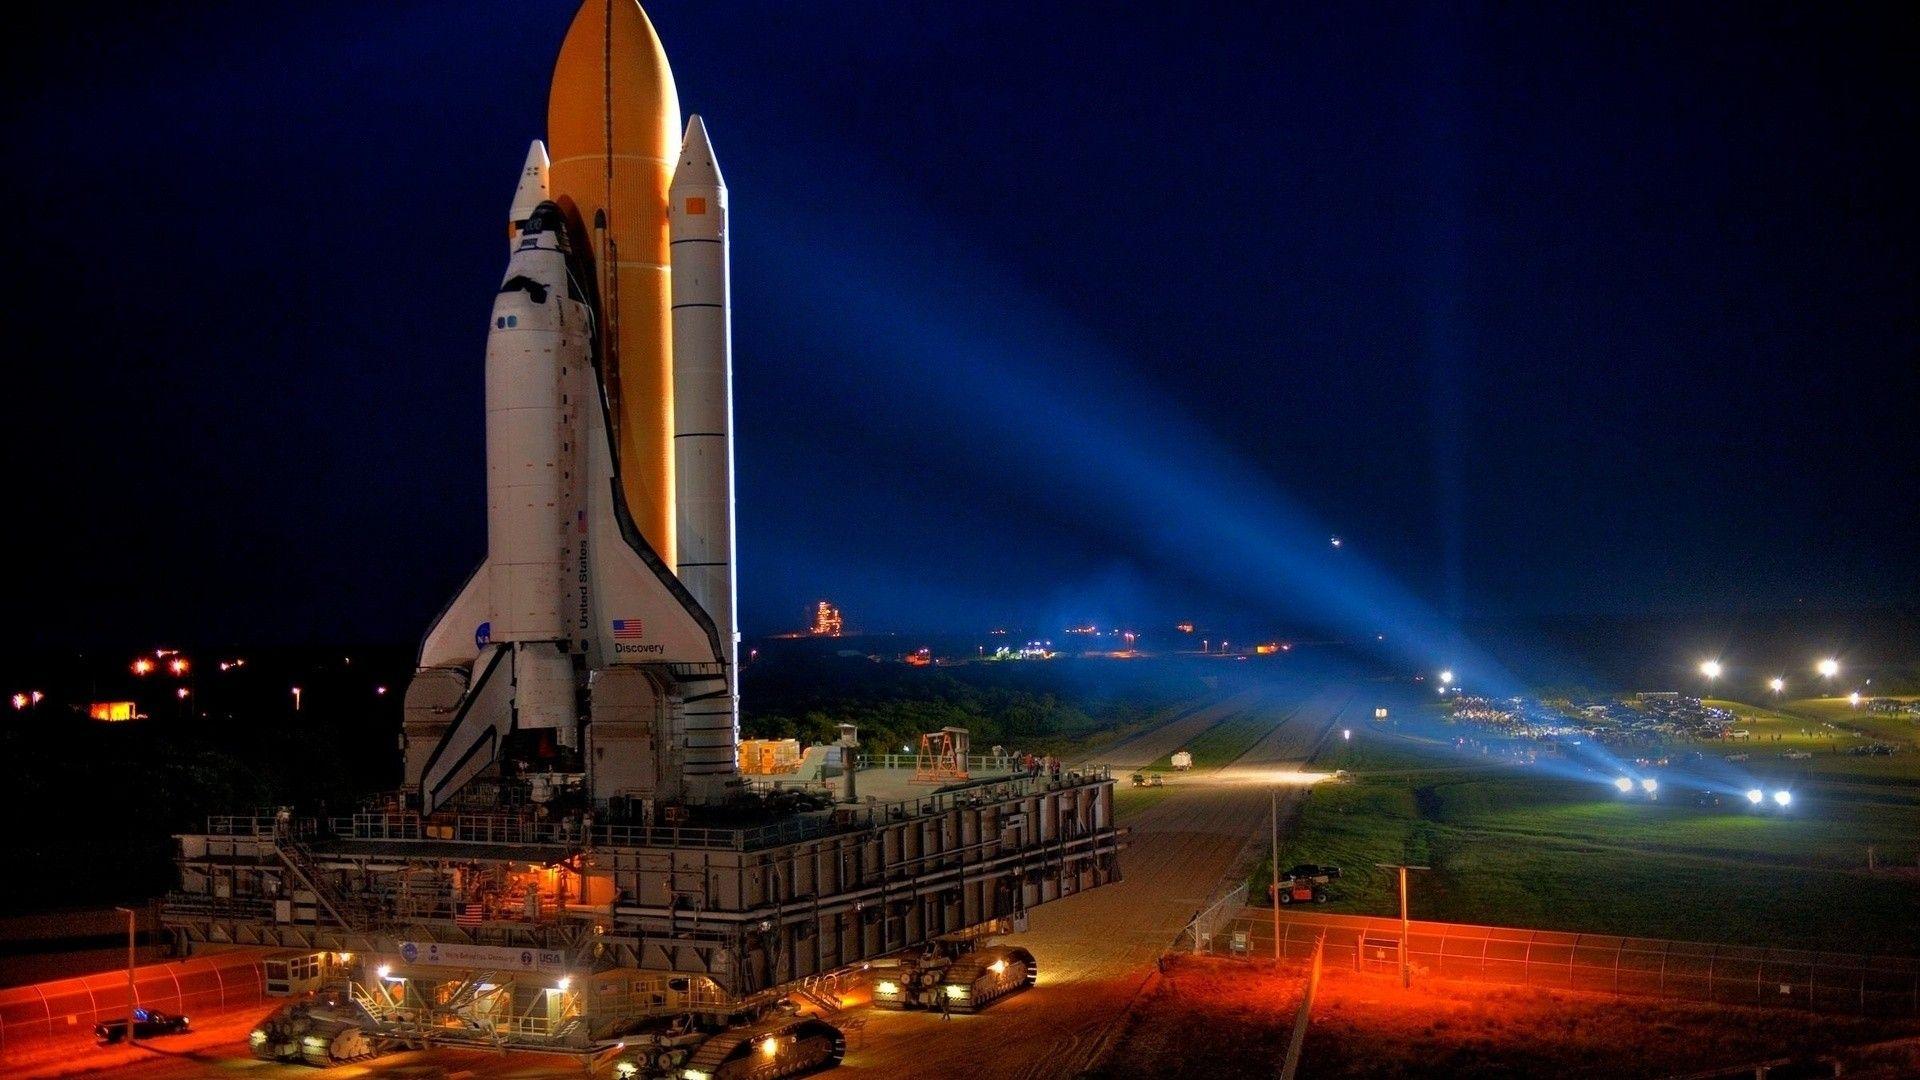 Rocket wallpaper photo hd